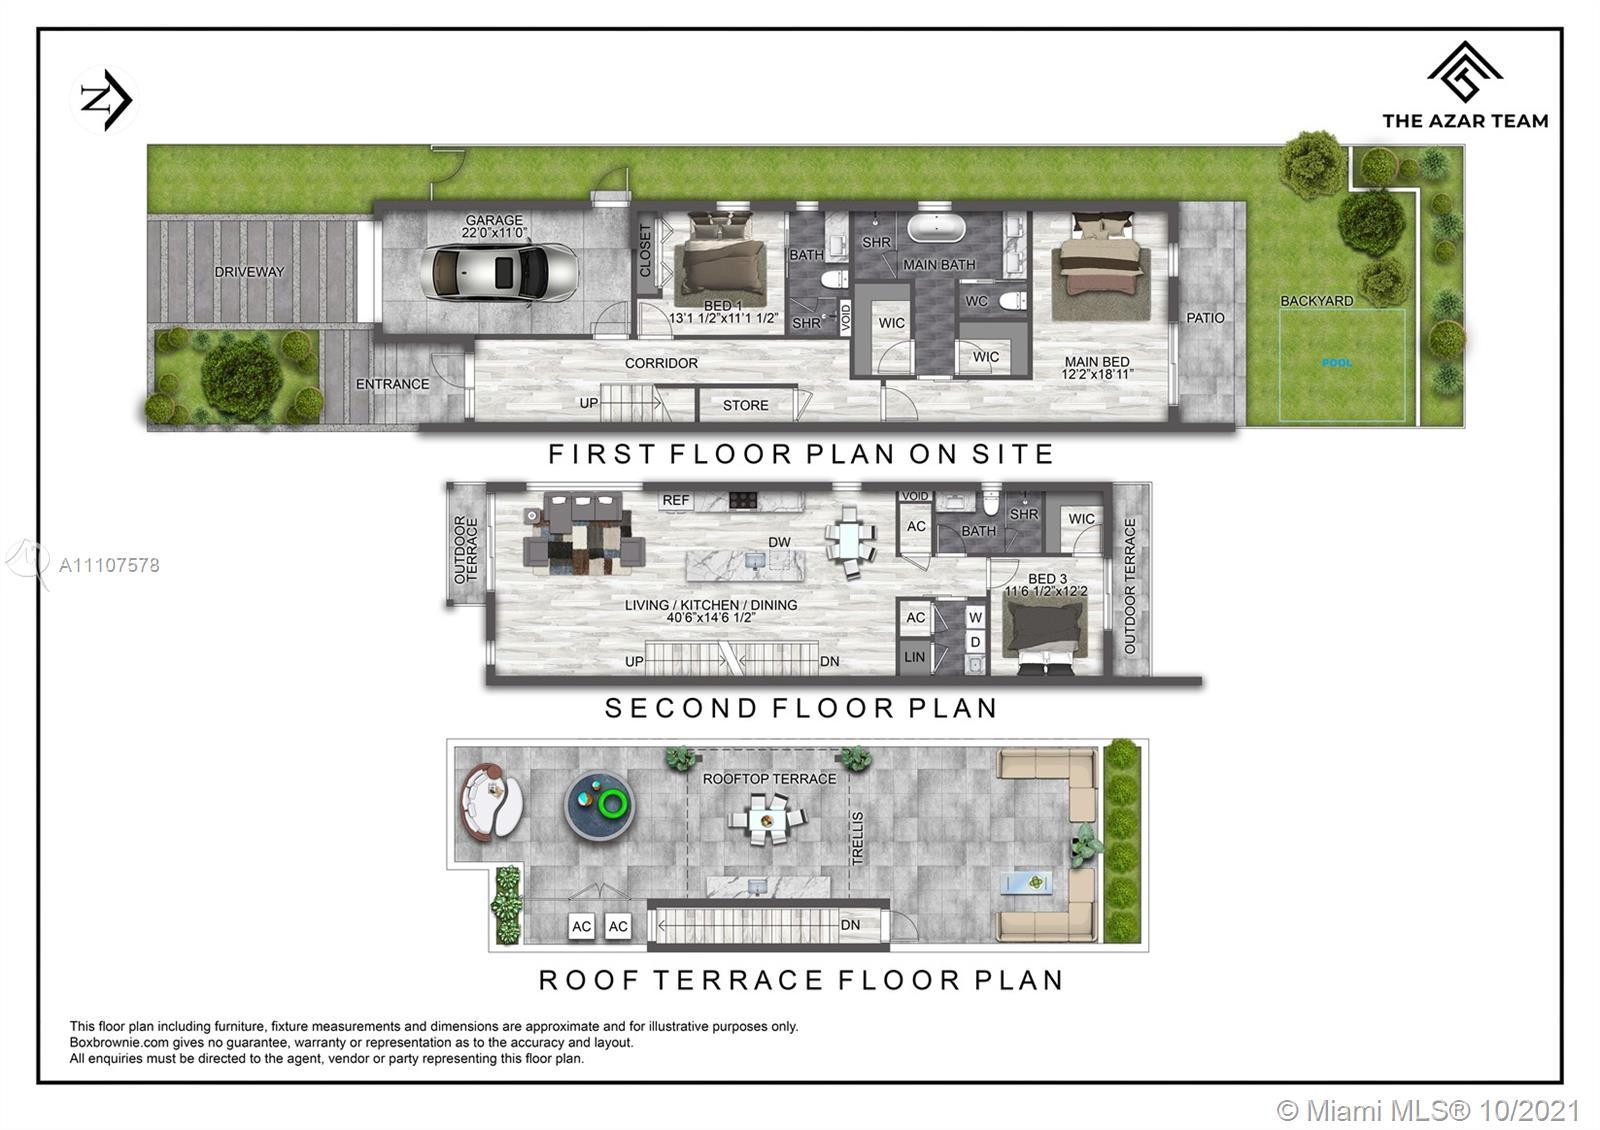 East Shenandoah #1377 - 1377 SW 22nd terrace #1377, Miami, FL 33145